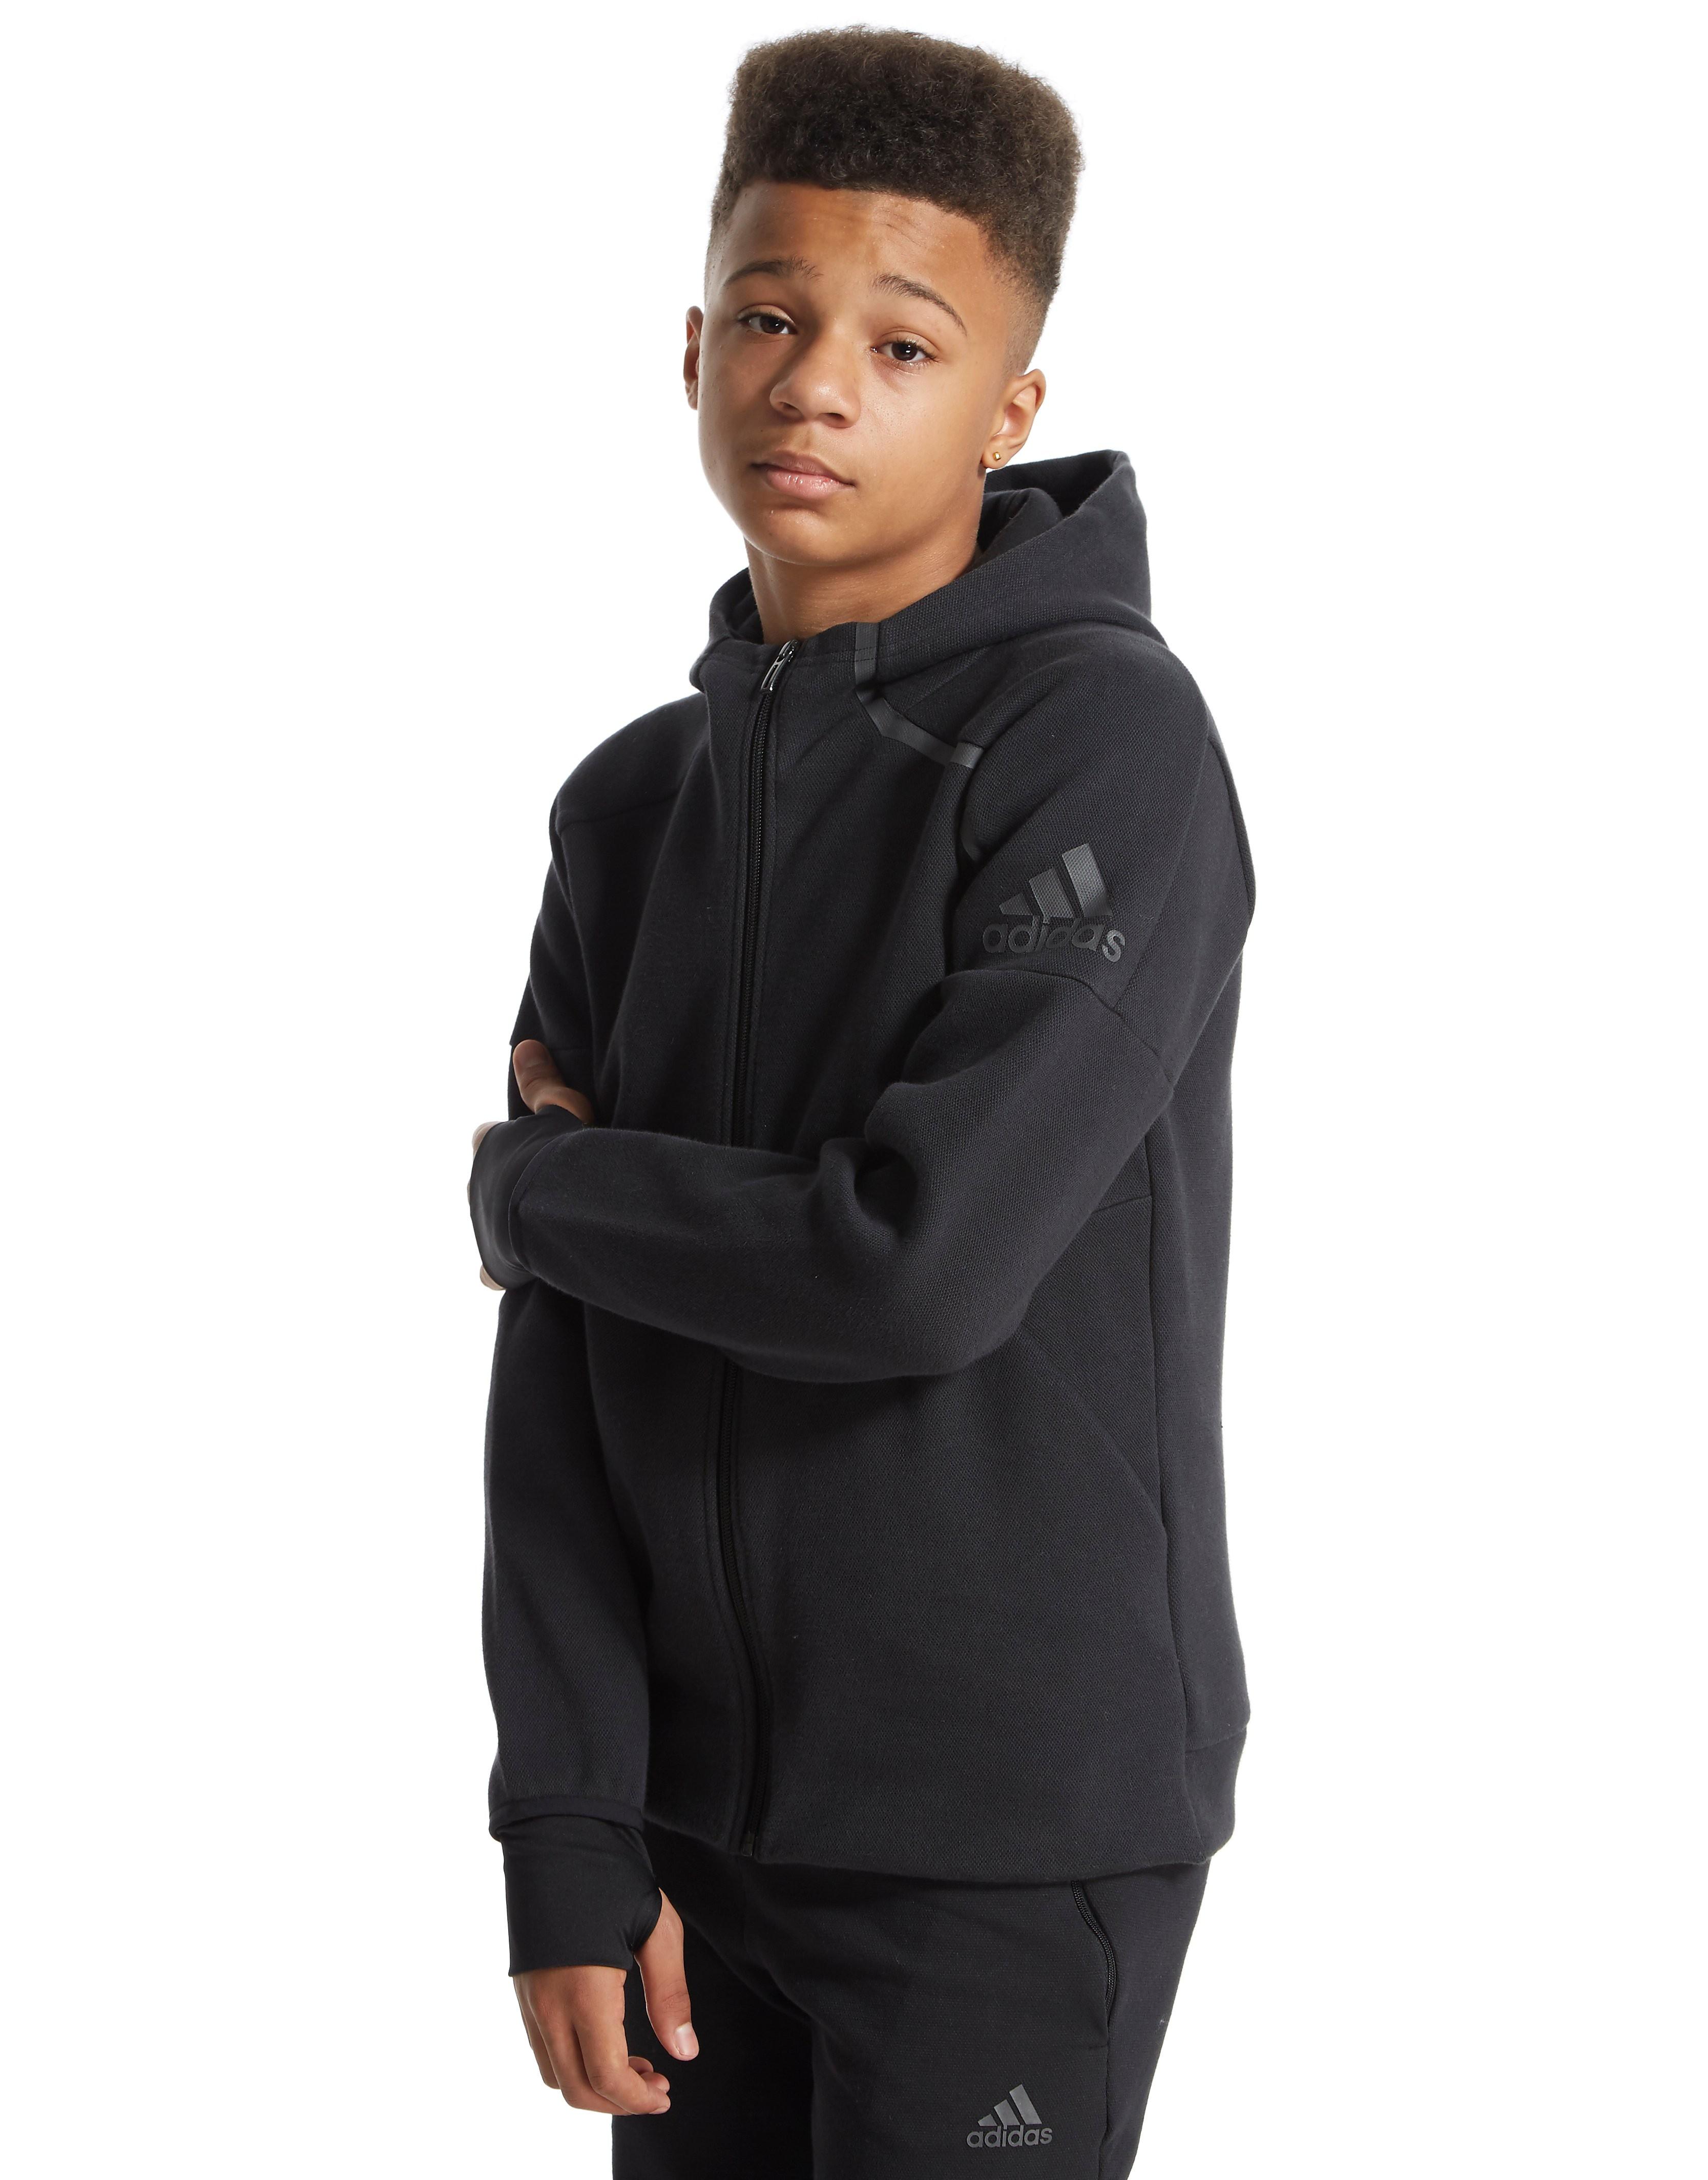 adidas Z.N.E Full Zip Hoody Junior